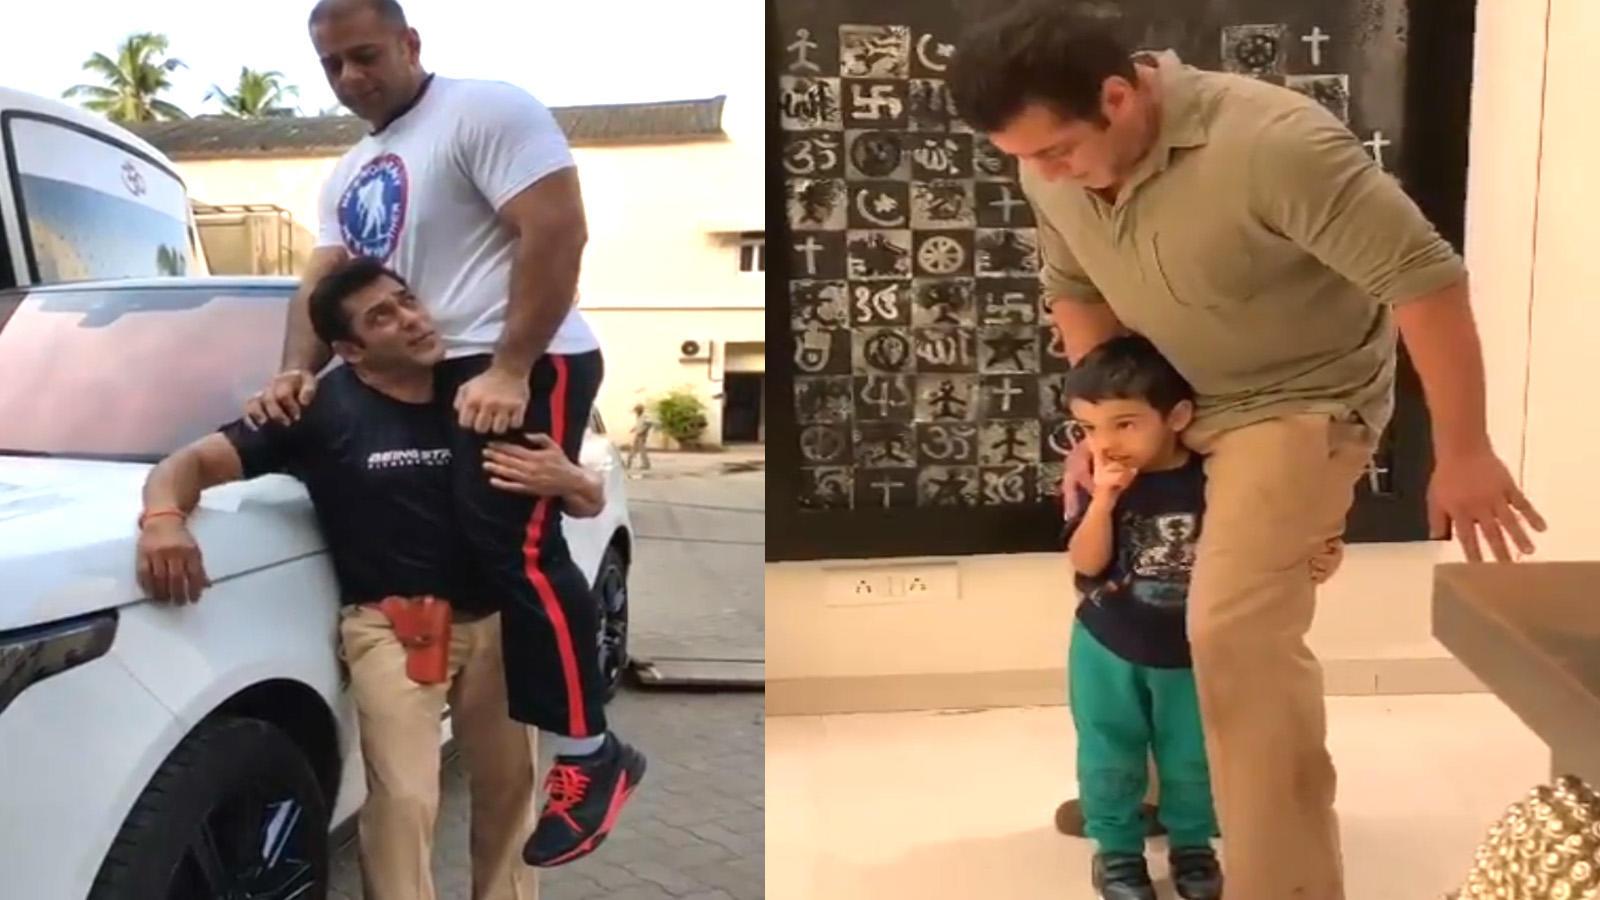 Watch! Salman Khan's hilarious videos with his nephews